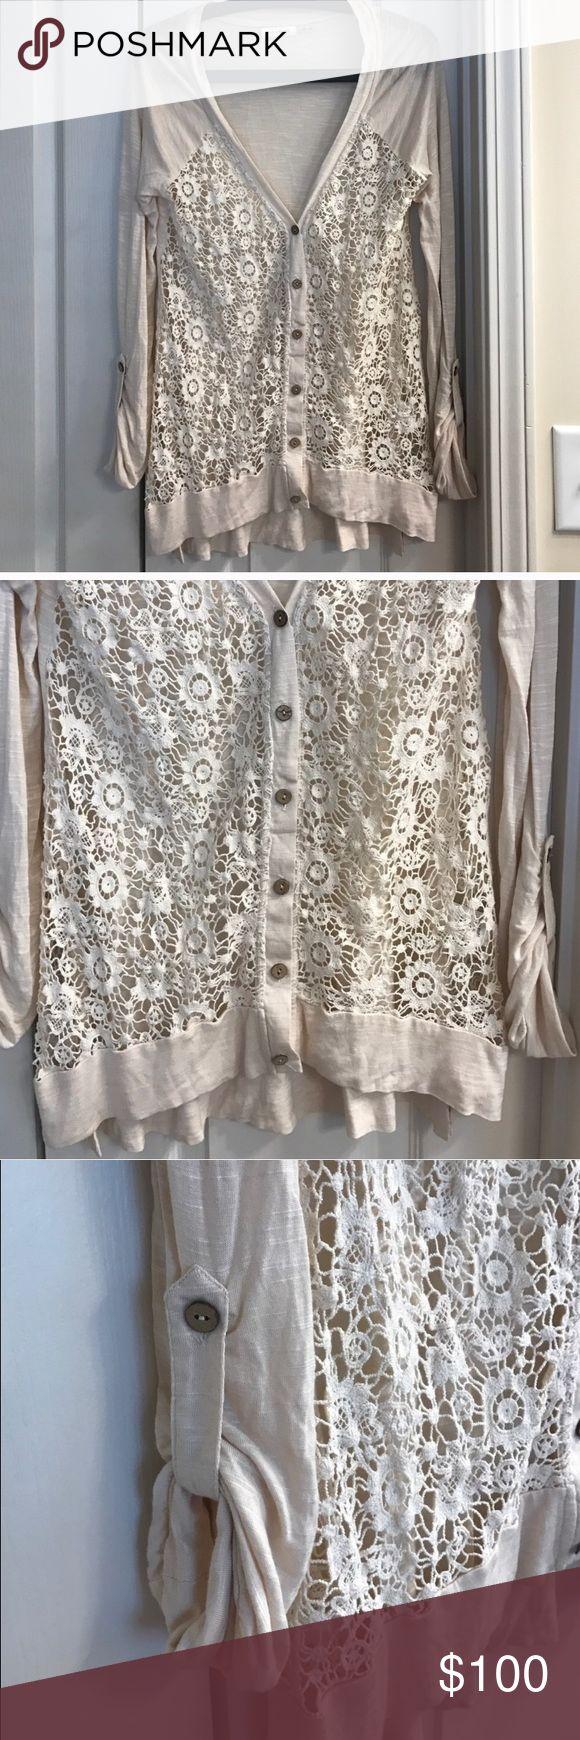 Size S beige lace floral Blu Pepper cardigan Size S beige lace floral Blu Pepper cardigan Blu Pepper Sweaters Cardigans